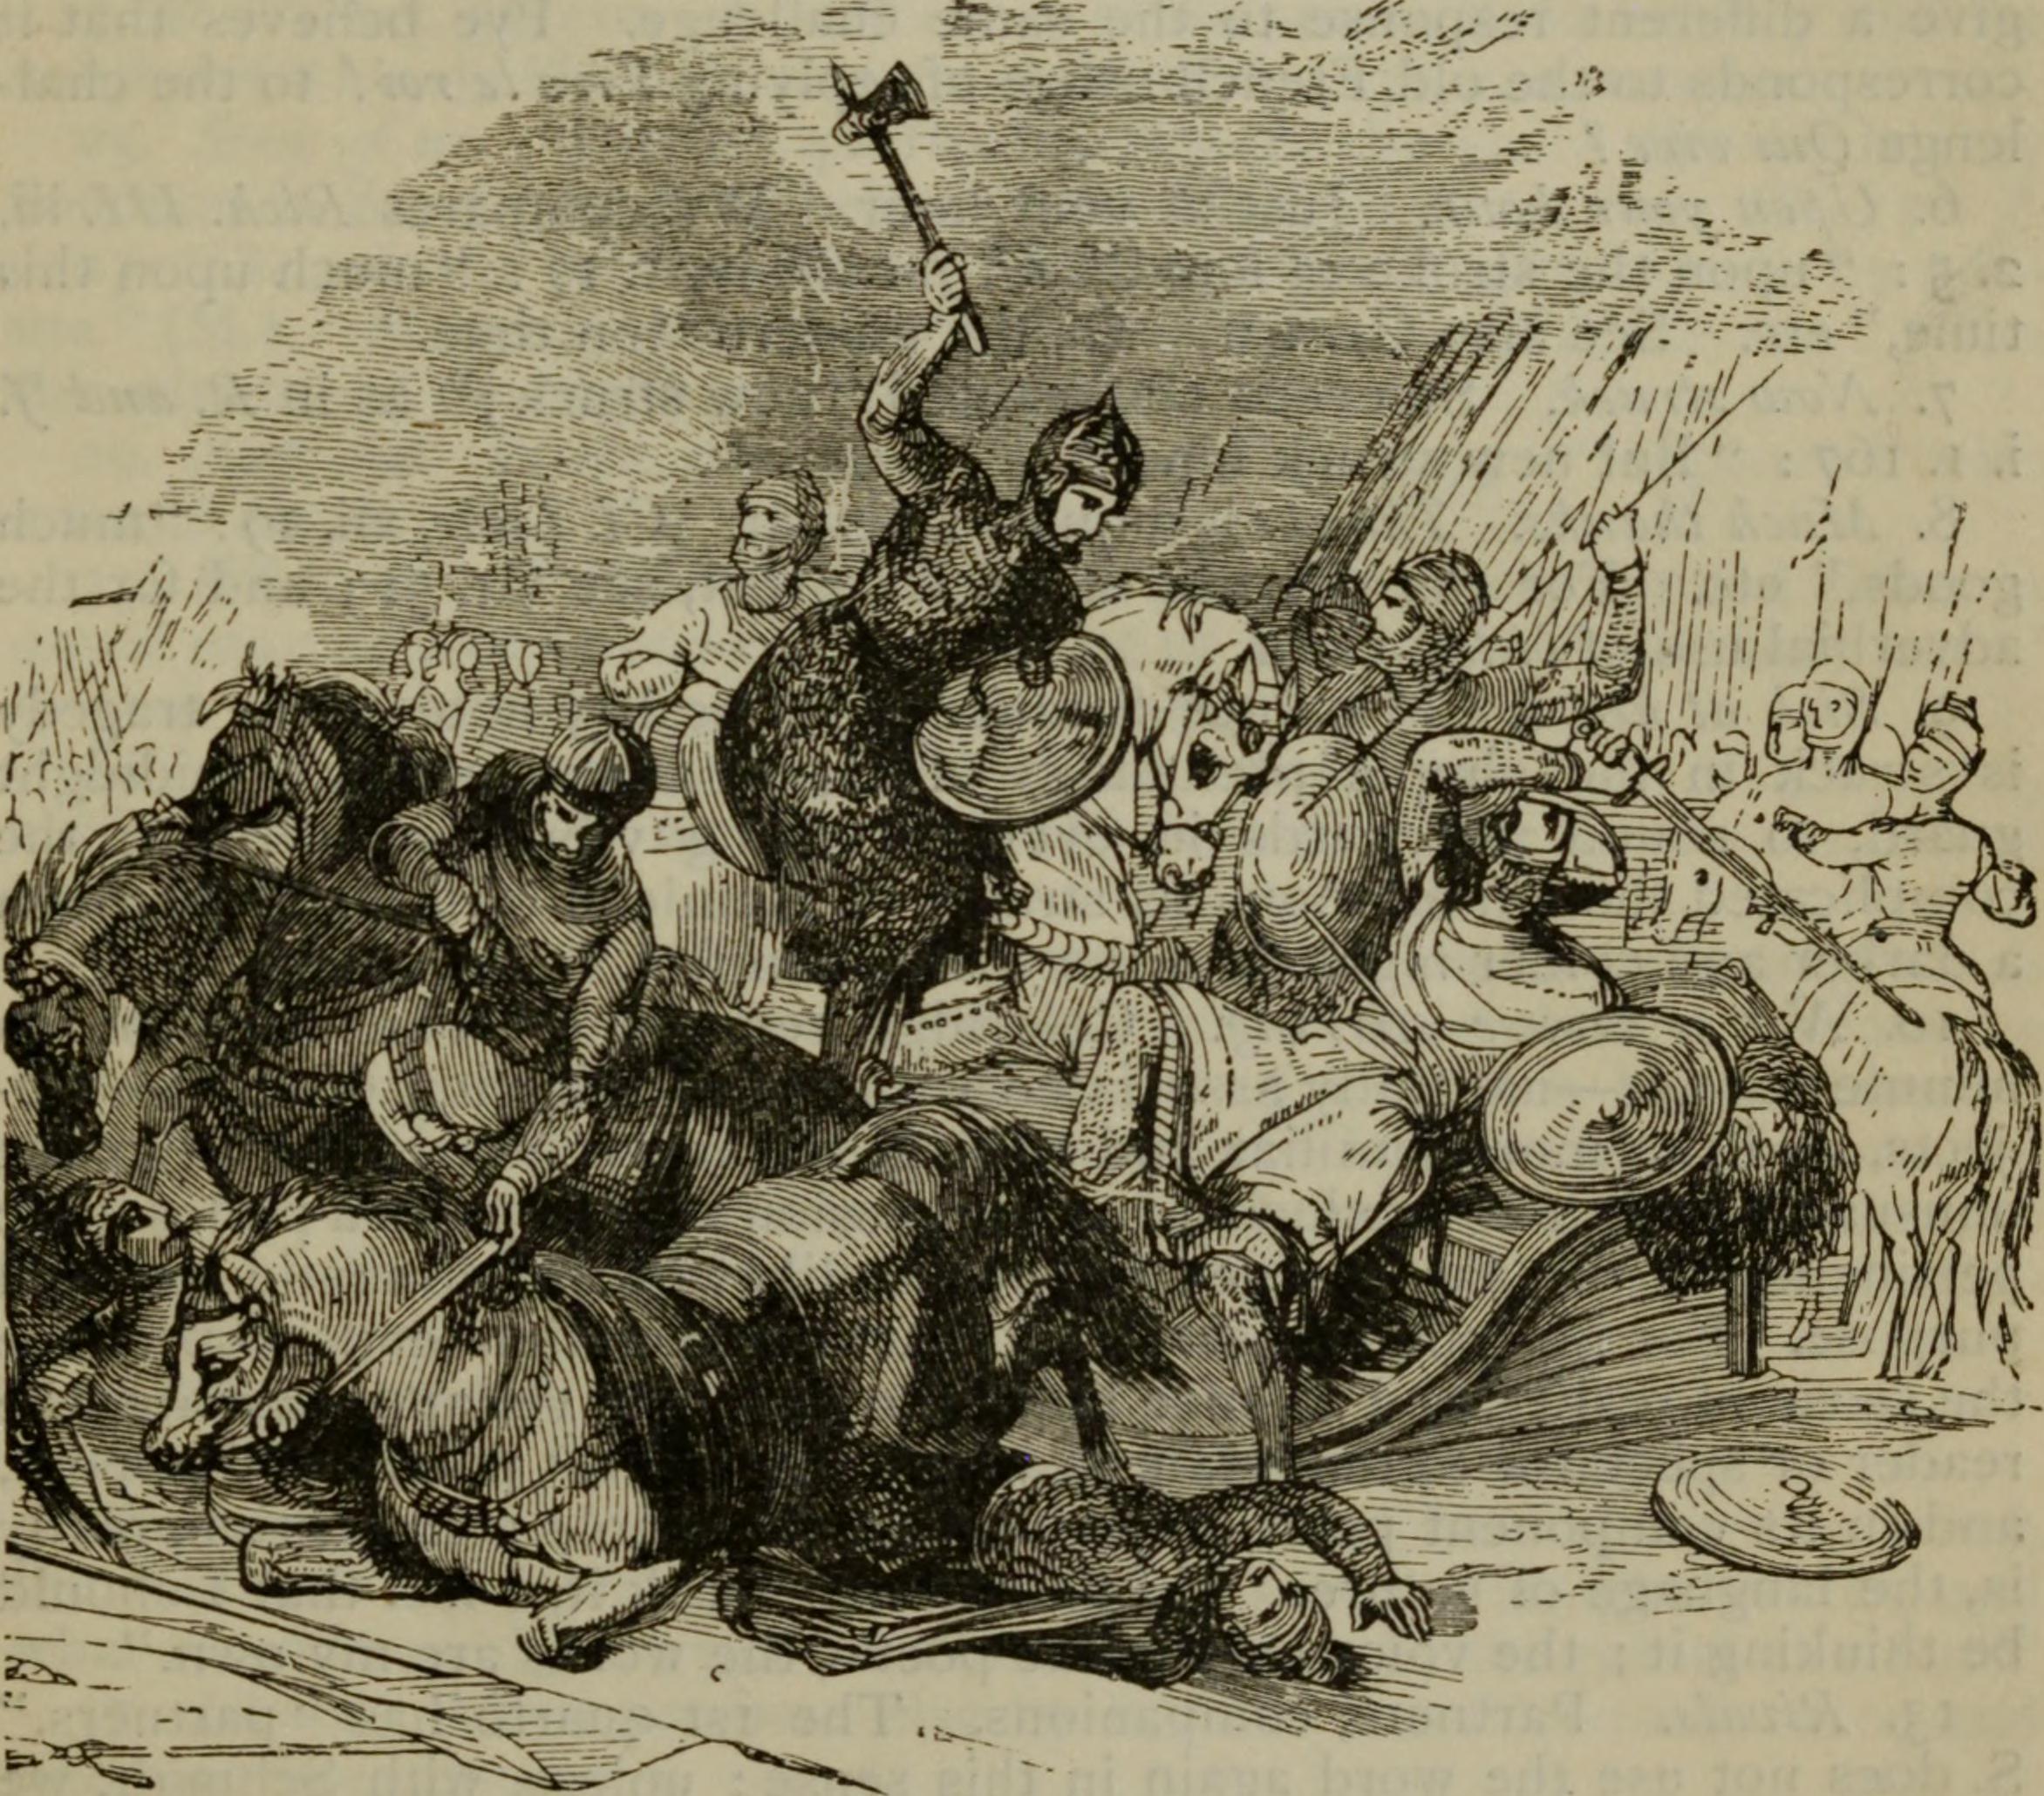 A description hamlet by william shakespeare about danish princes